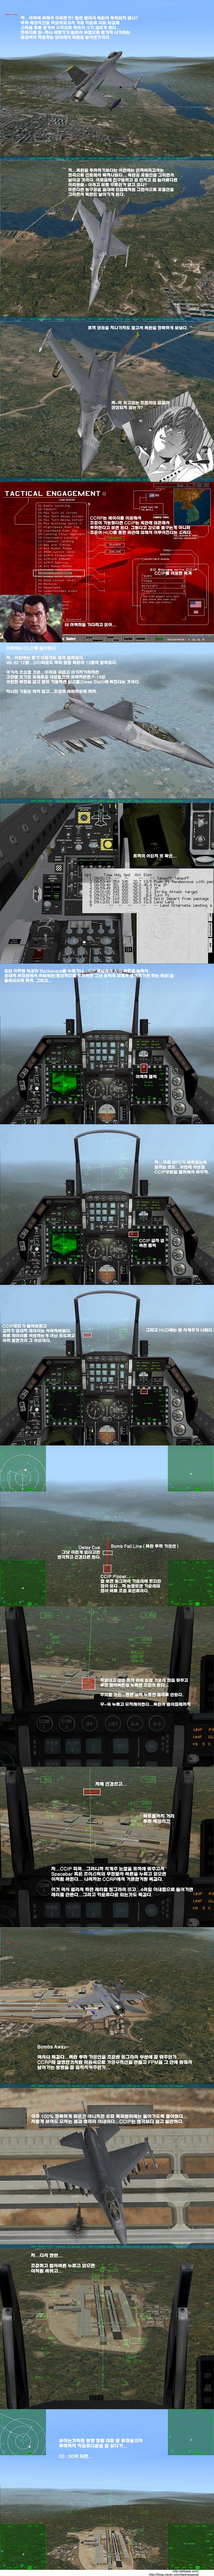 manual_14_bomb2.jpg